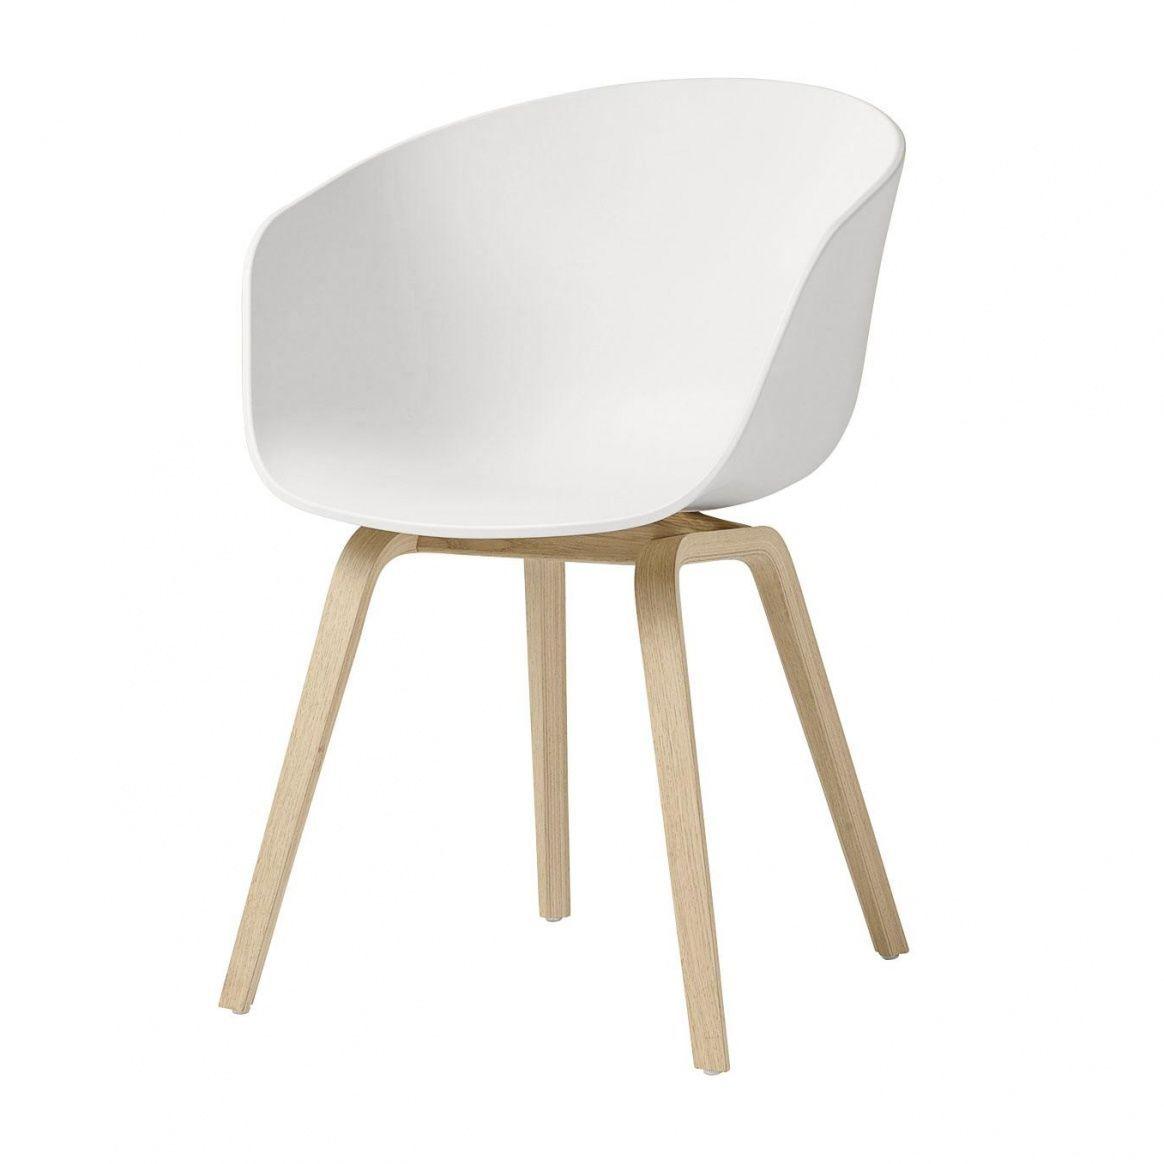 About A Chair 22 Armchair.Hay About A Chair 22 Armchair Industrial Design Hay Chair Chair